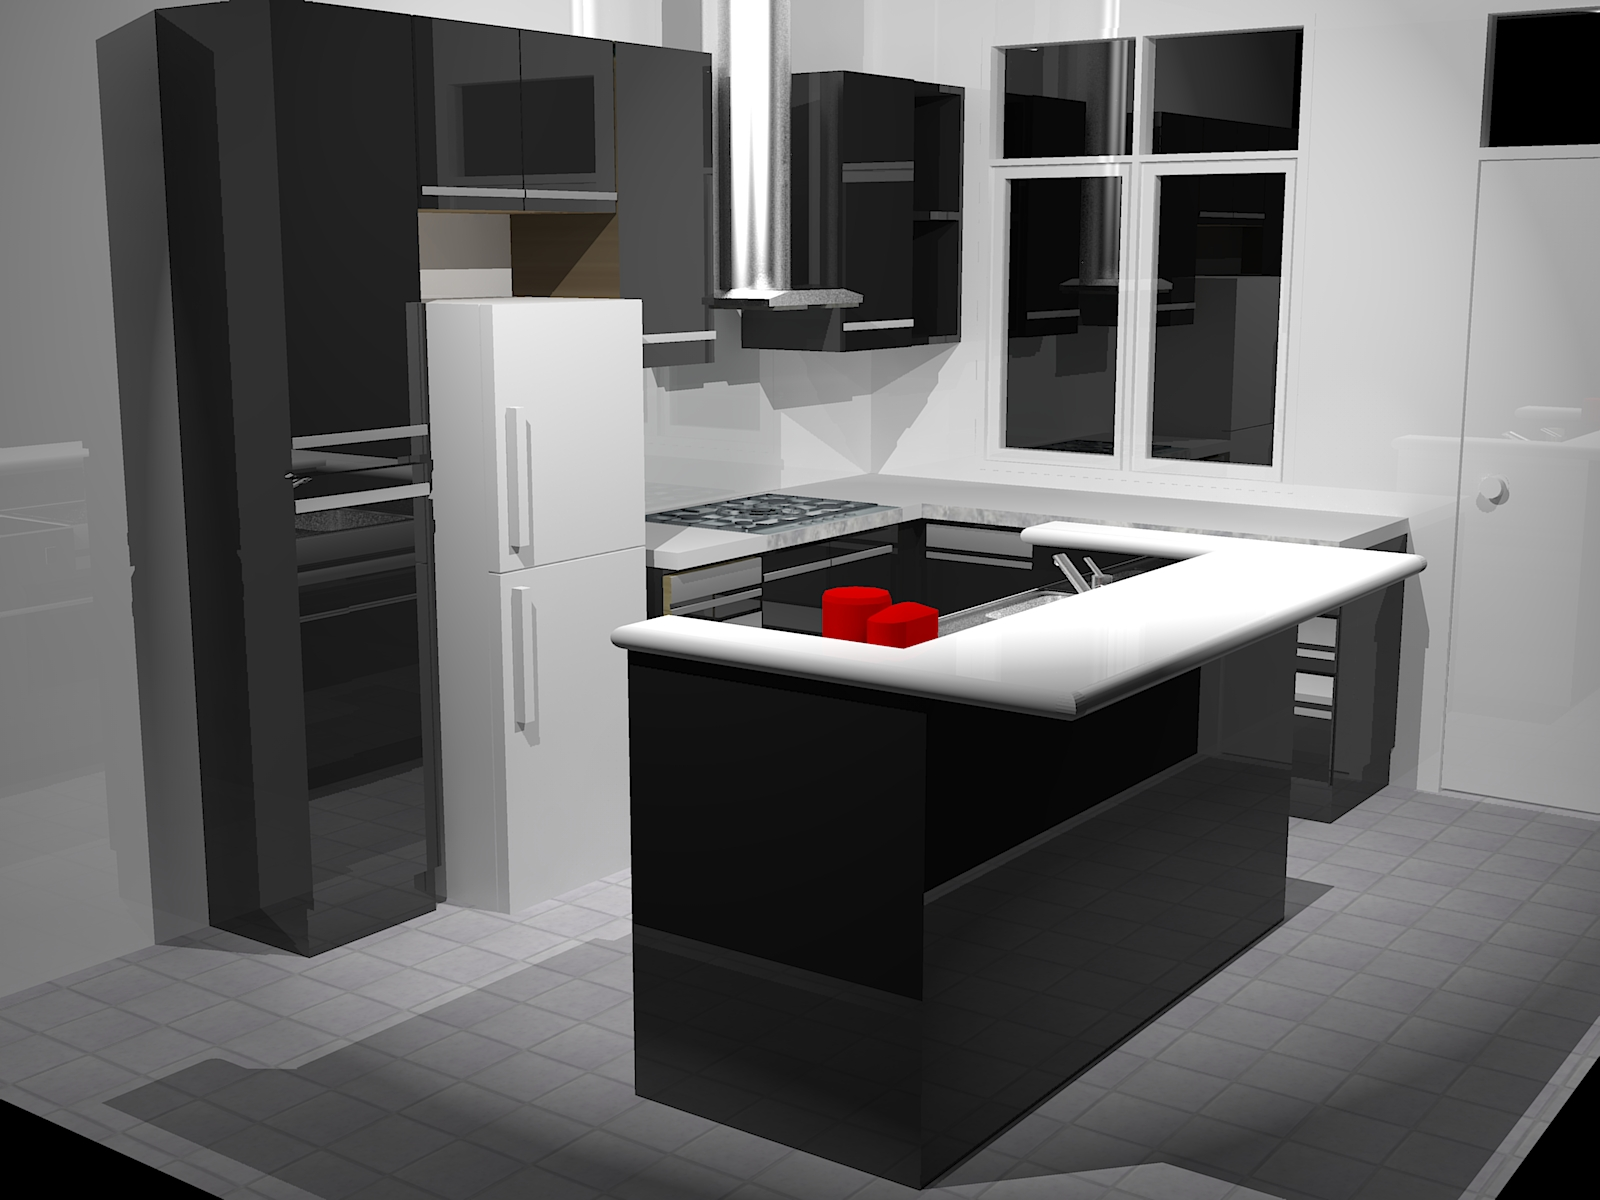 10x10 kitchen design light maple cabinets custom craze